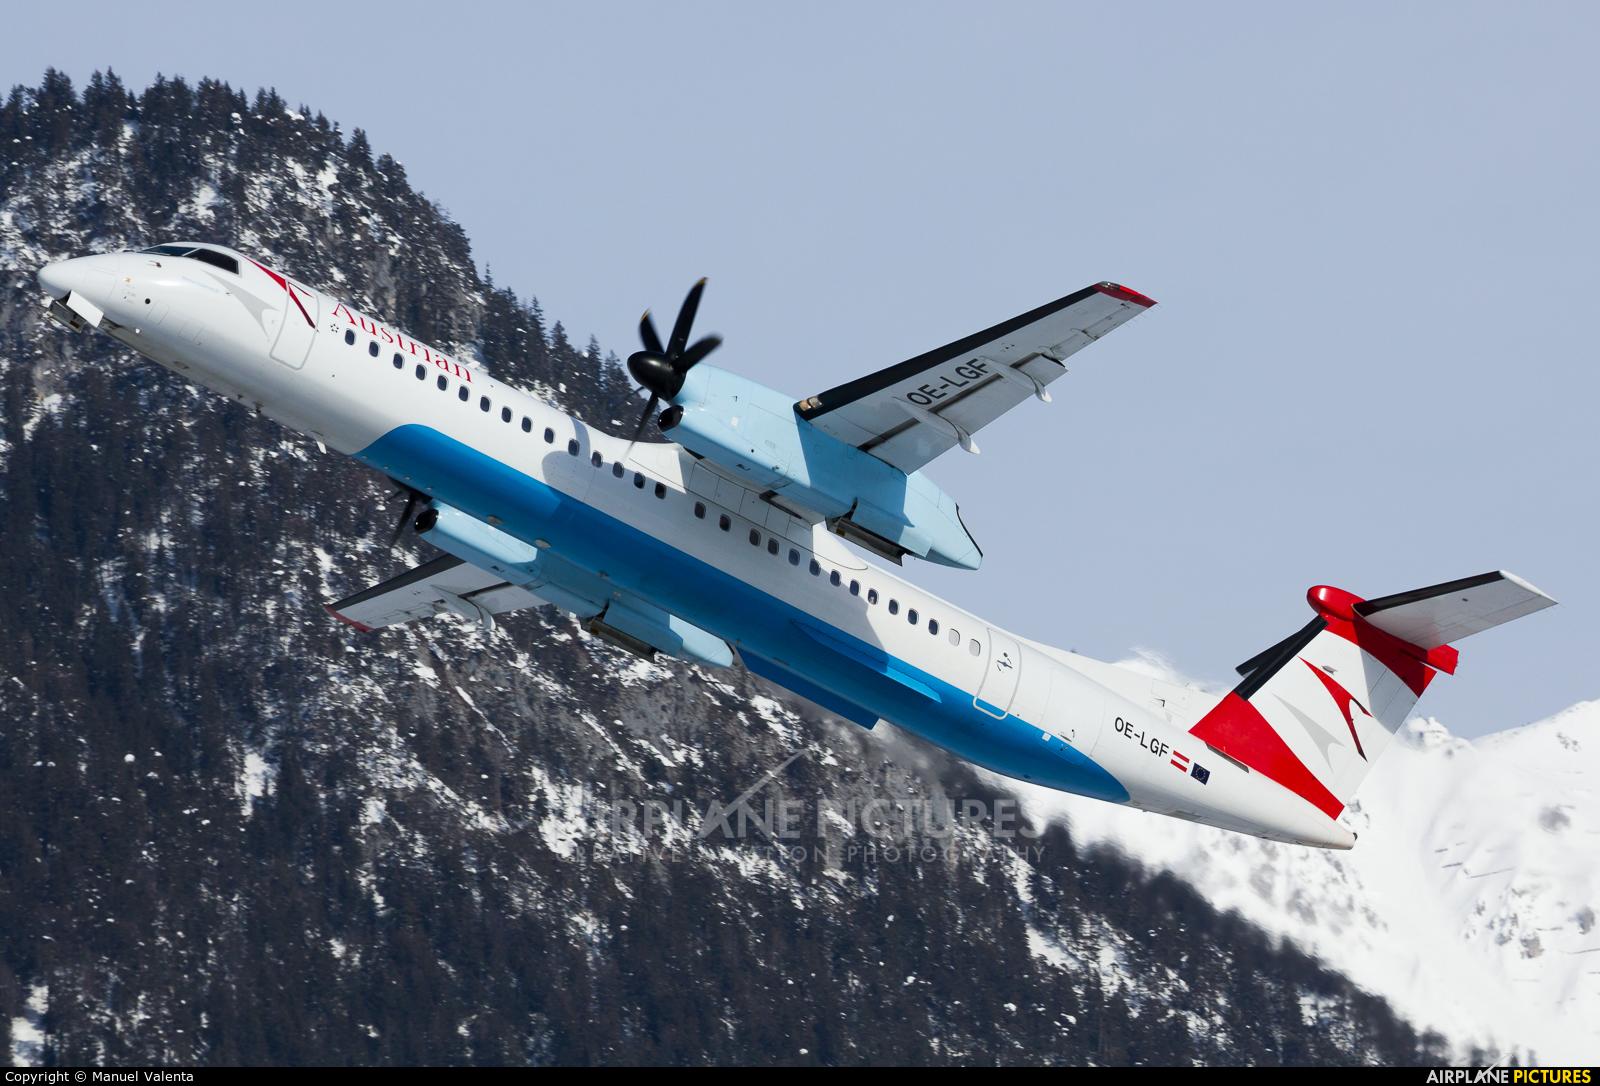 Austrian Airlines/Arrows/Tyrolean OE-LGF aircraft at Innsbruck